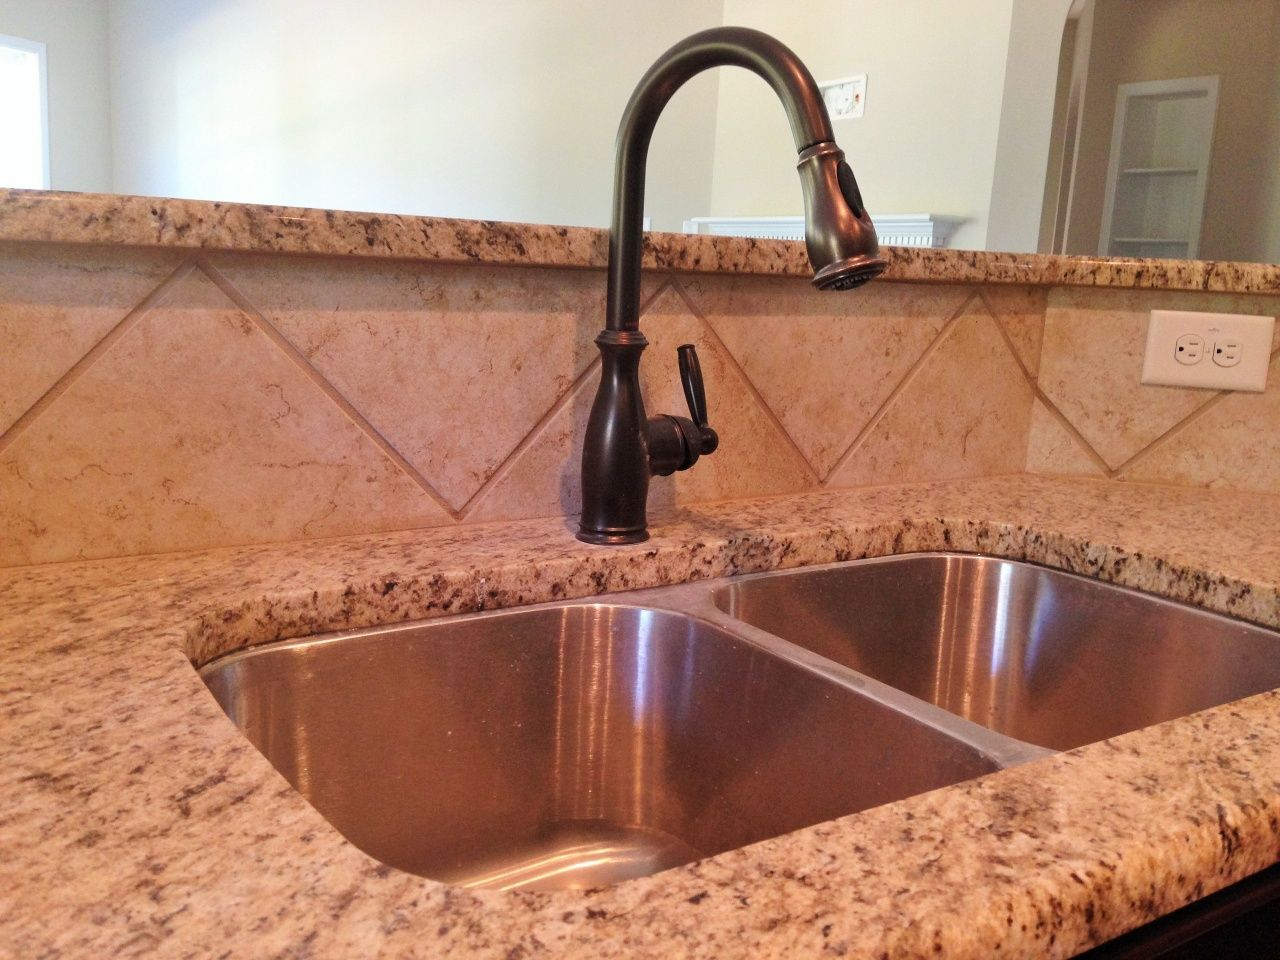 Granite Countertops With Tile Backsplash Installing Granite Countertops Granite Countertops Granite Tile Countertops